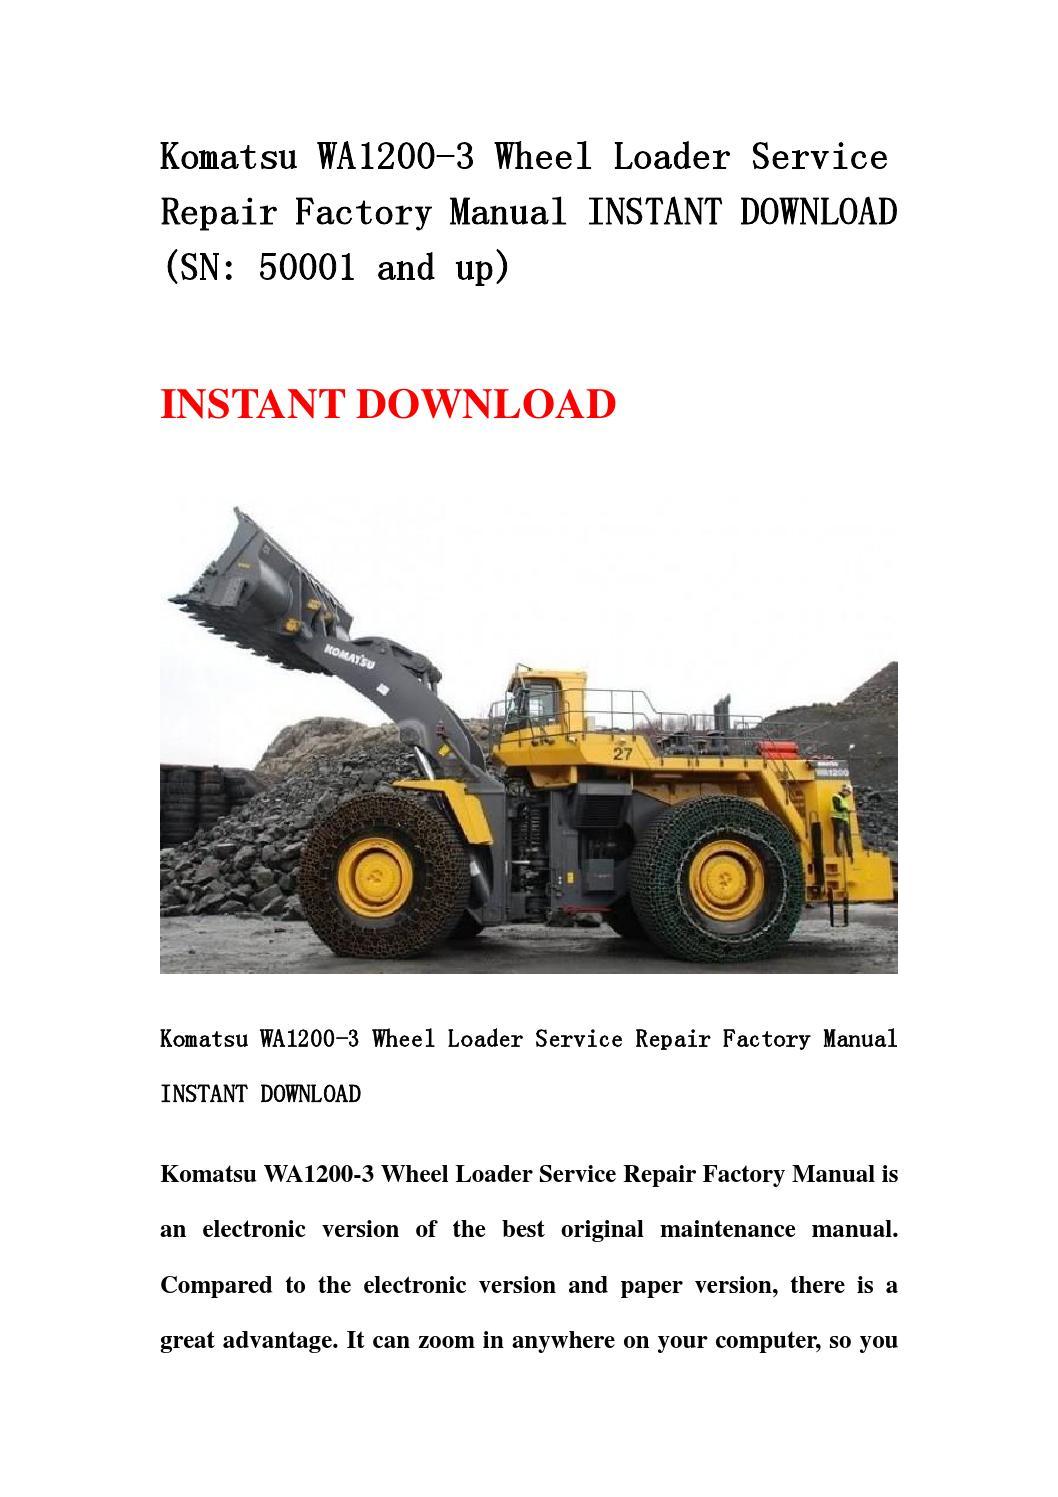 komatsu wa1200 6 wheel loader service repair factory. Black Bedroom Furniture Sets. Home Design Ideas